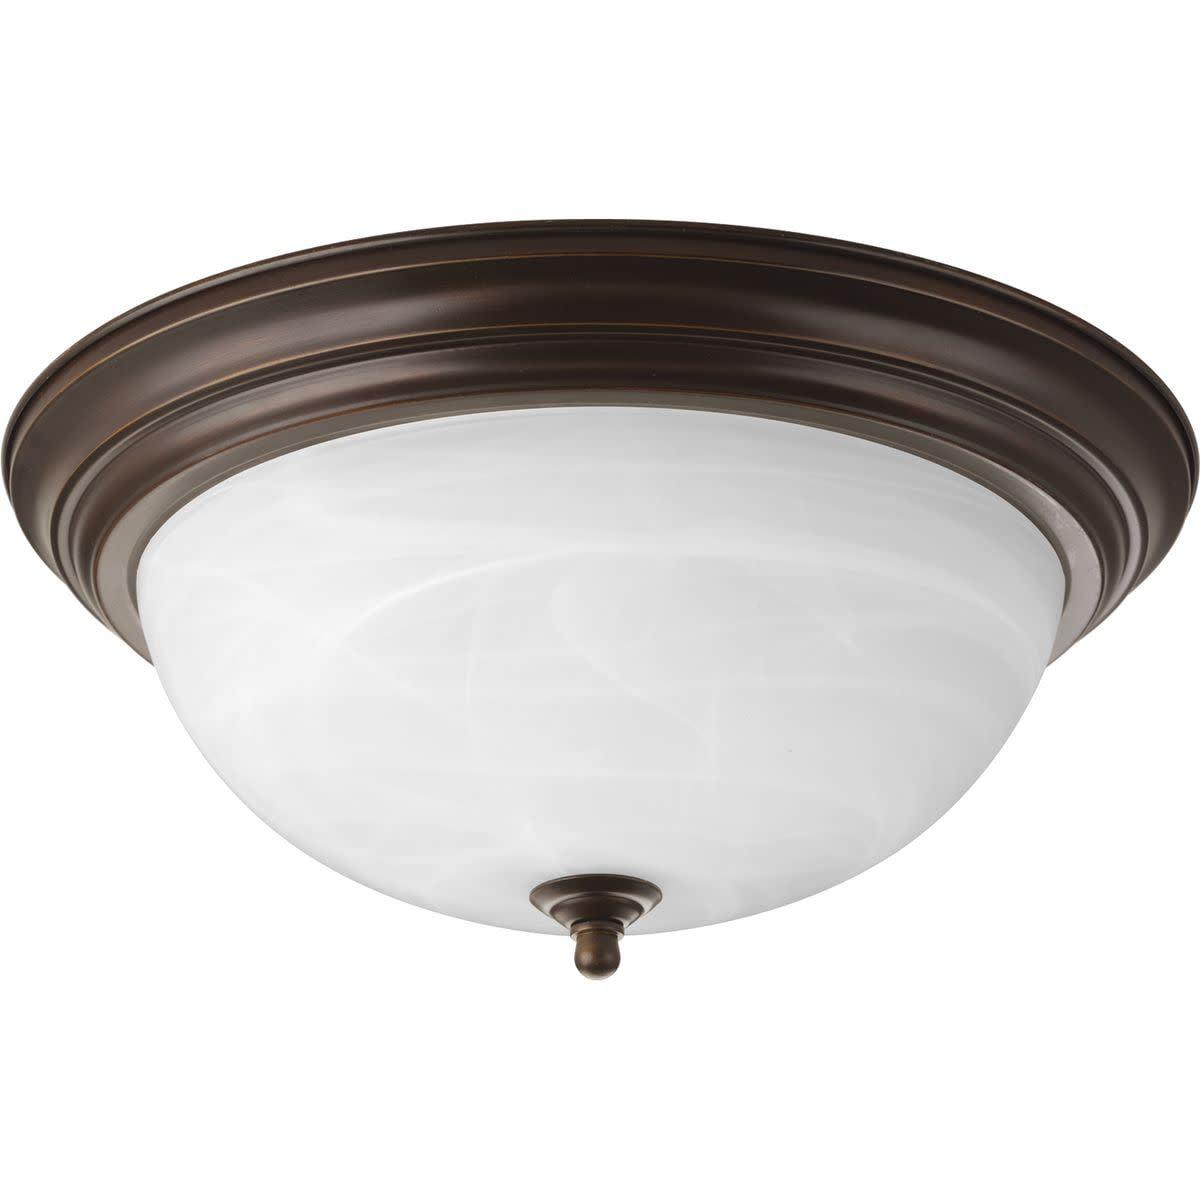 "Progress Lighting P3926 Melon 3 Light Flush Mount Ceiling Fixture with Alabaster Glass Shade - 15"" Wide"